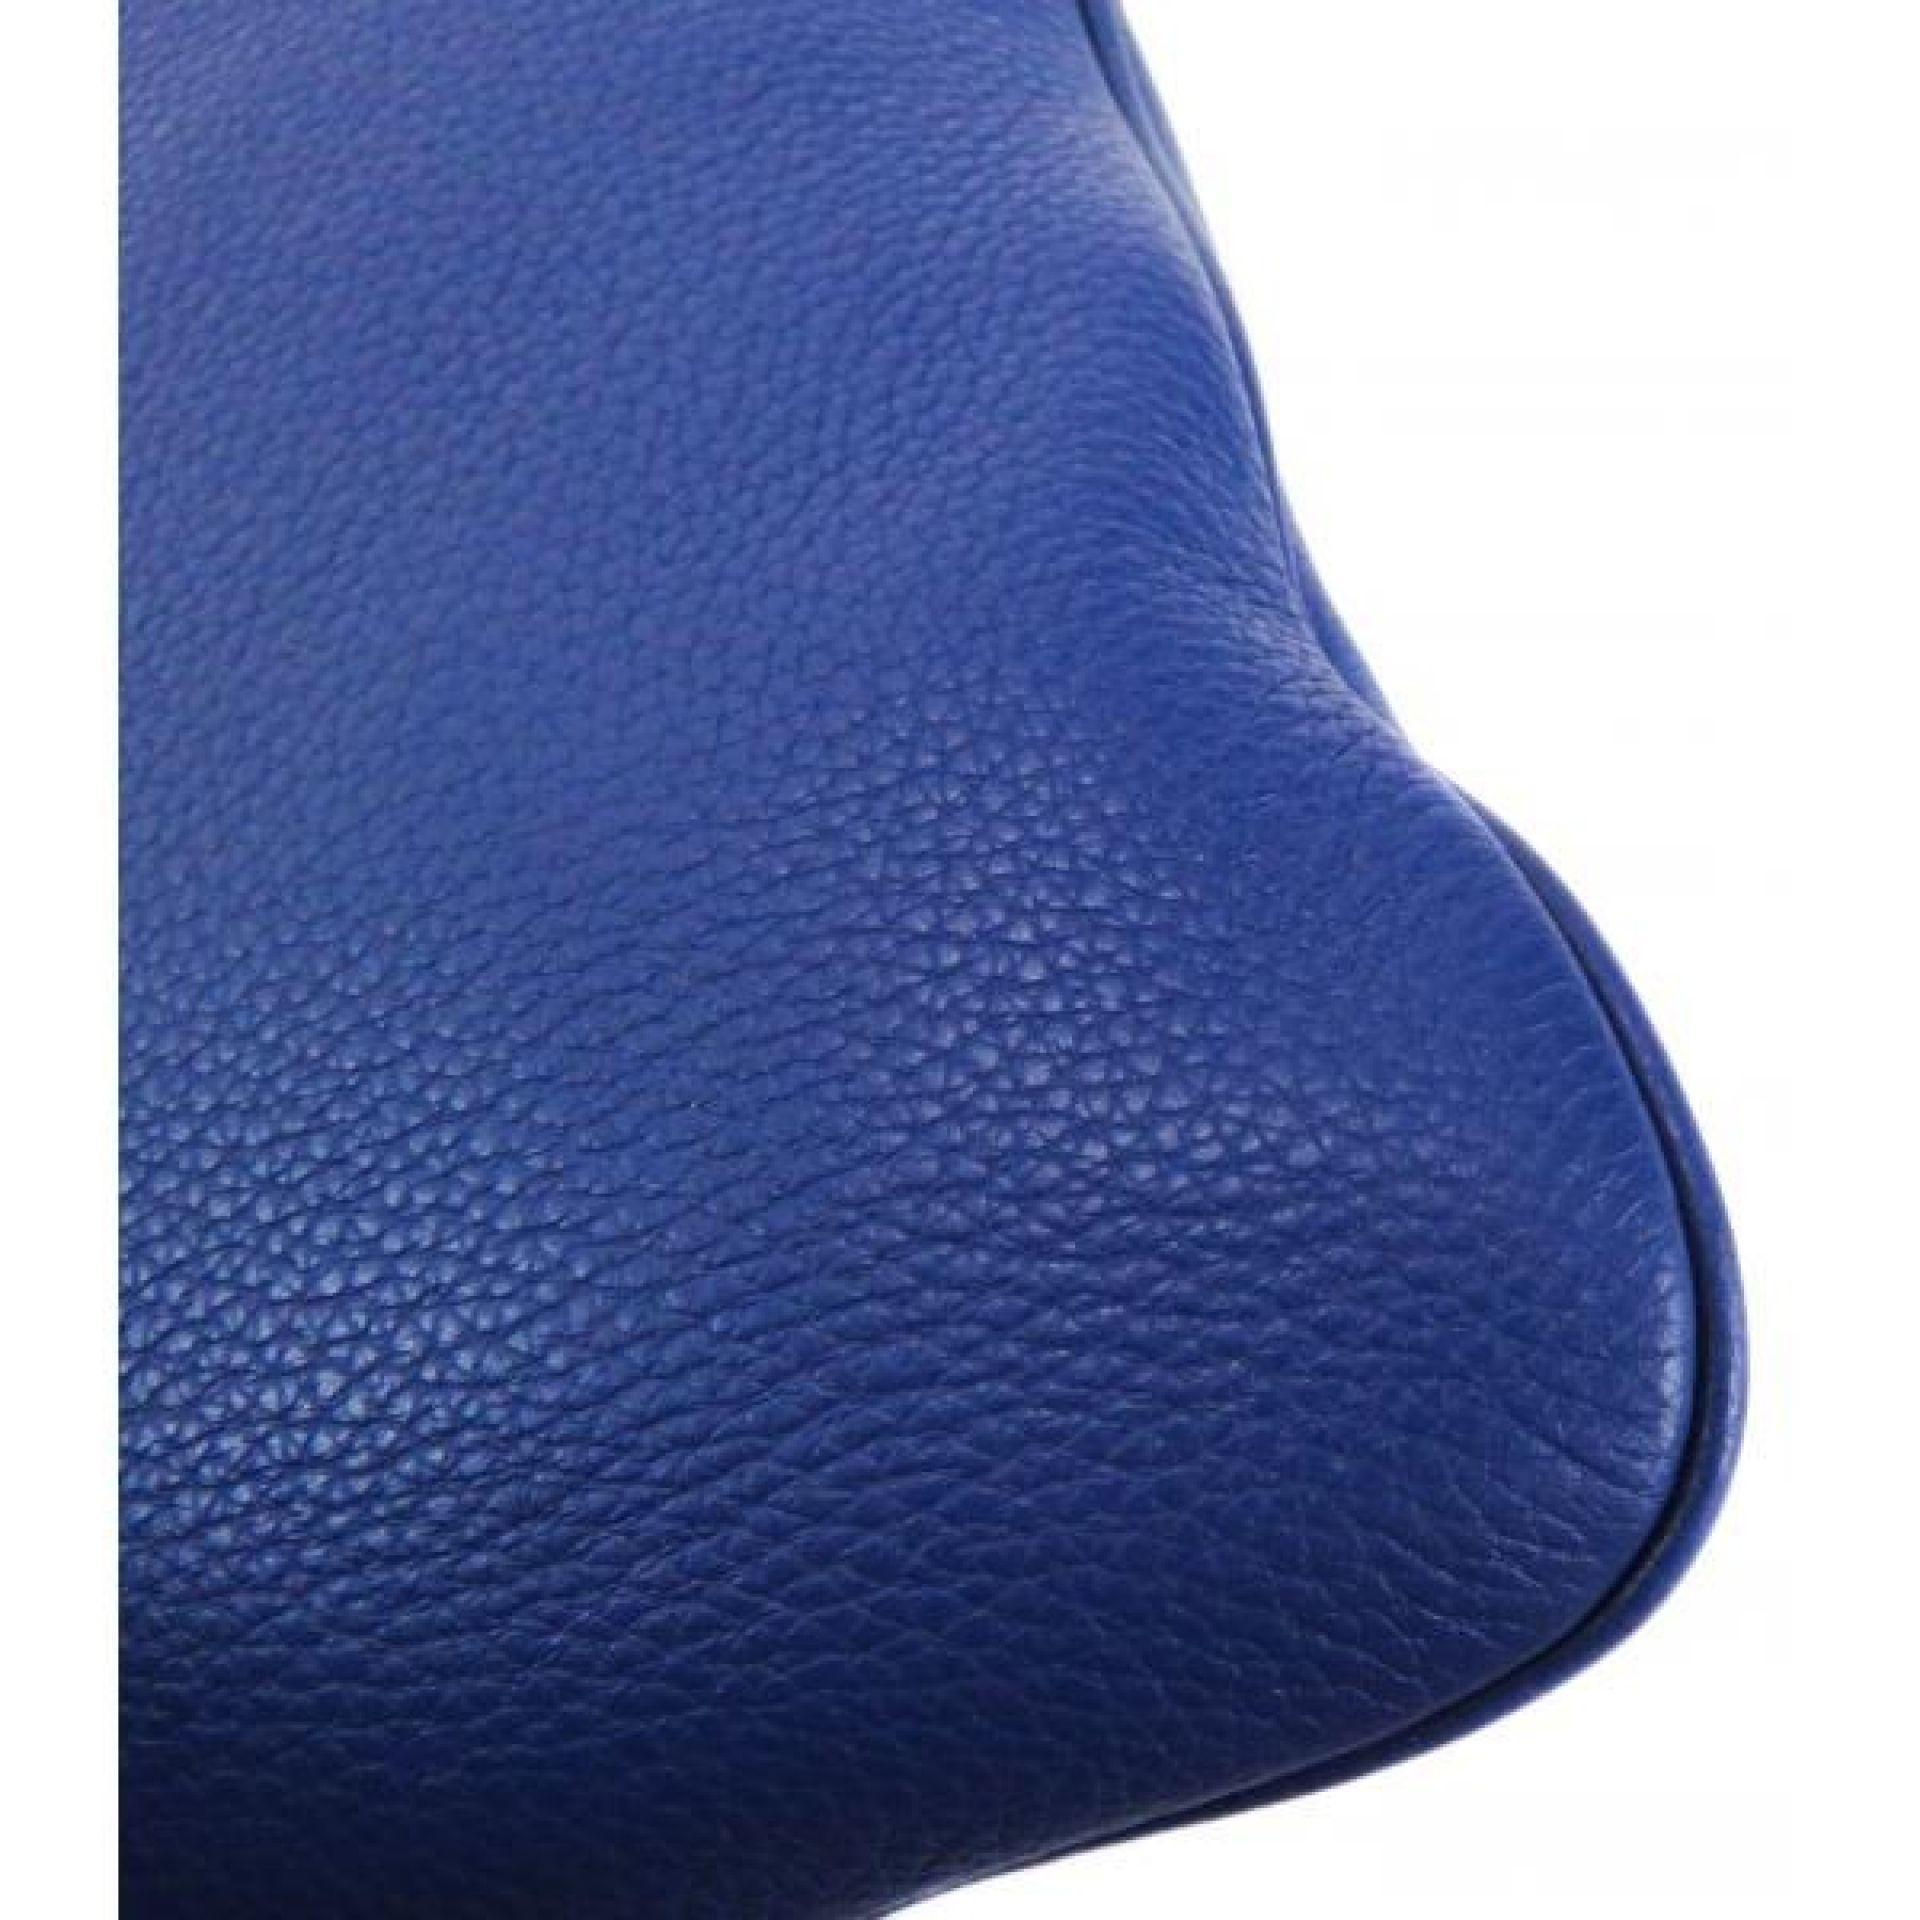 Kate Spade Blue Leather Cobble Hill Ellen Crossbody Bag